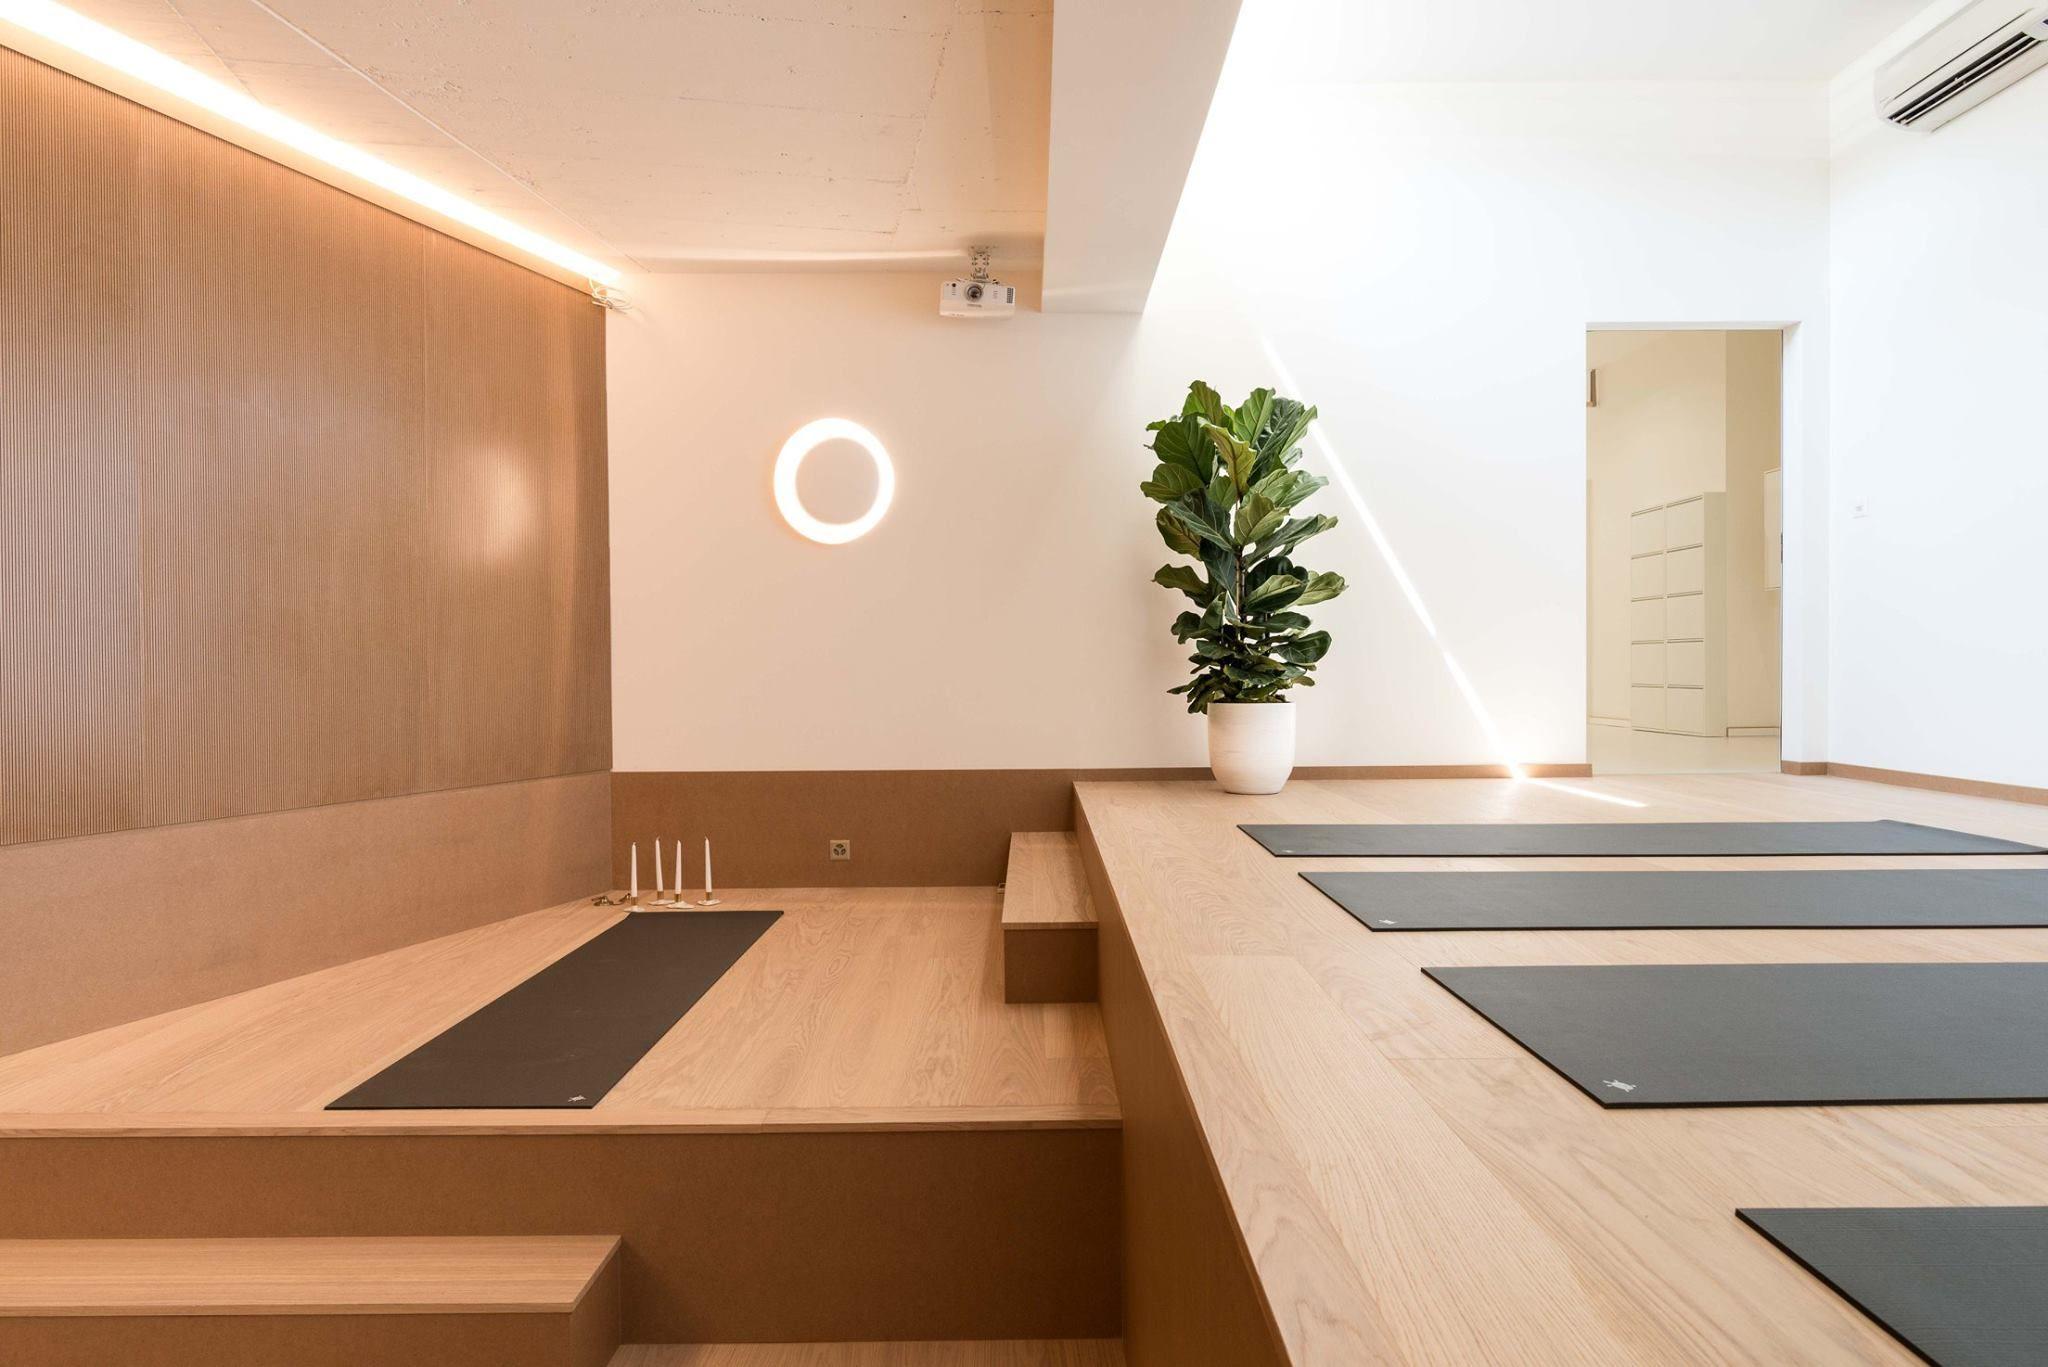 salle de yoga pilates atmosfera 2019. Black Bedroom Furniture Sets. Home Design Ideas